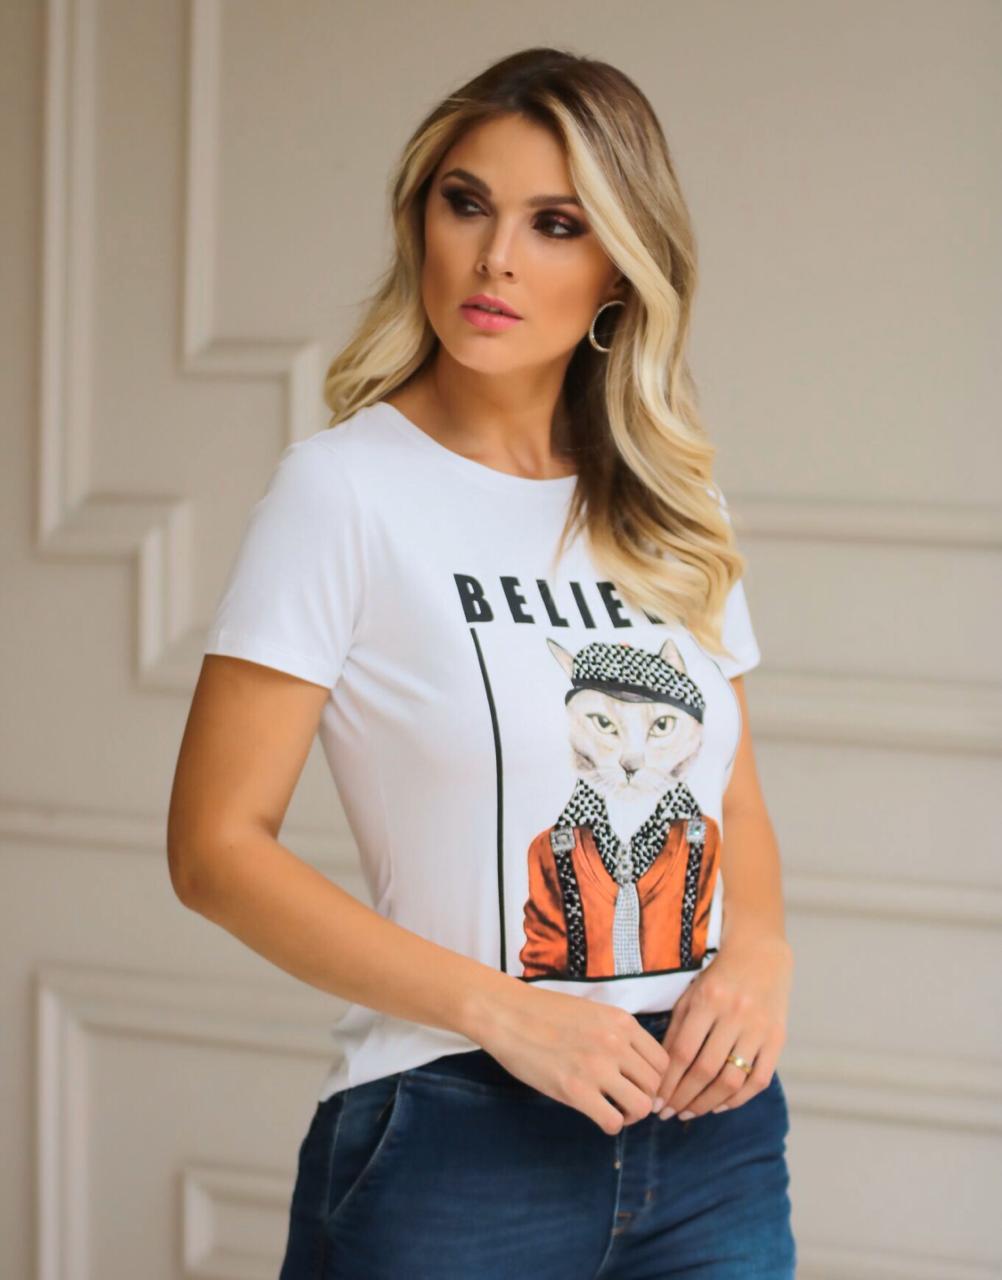 T-Shirt  Believe  Viscolycra Estampa